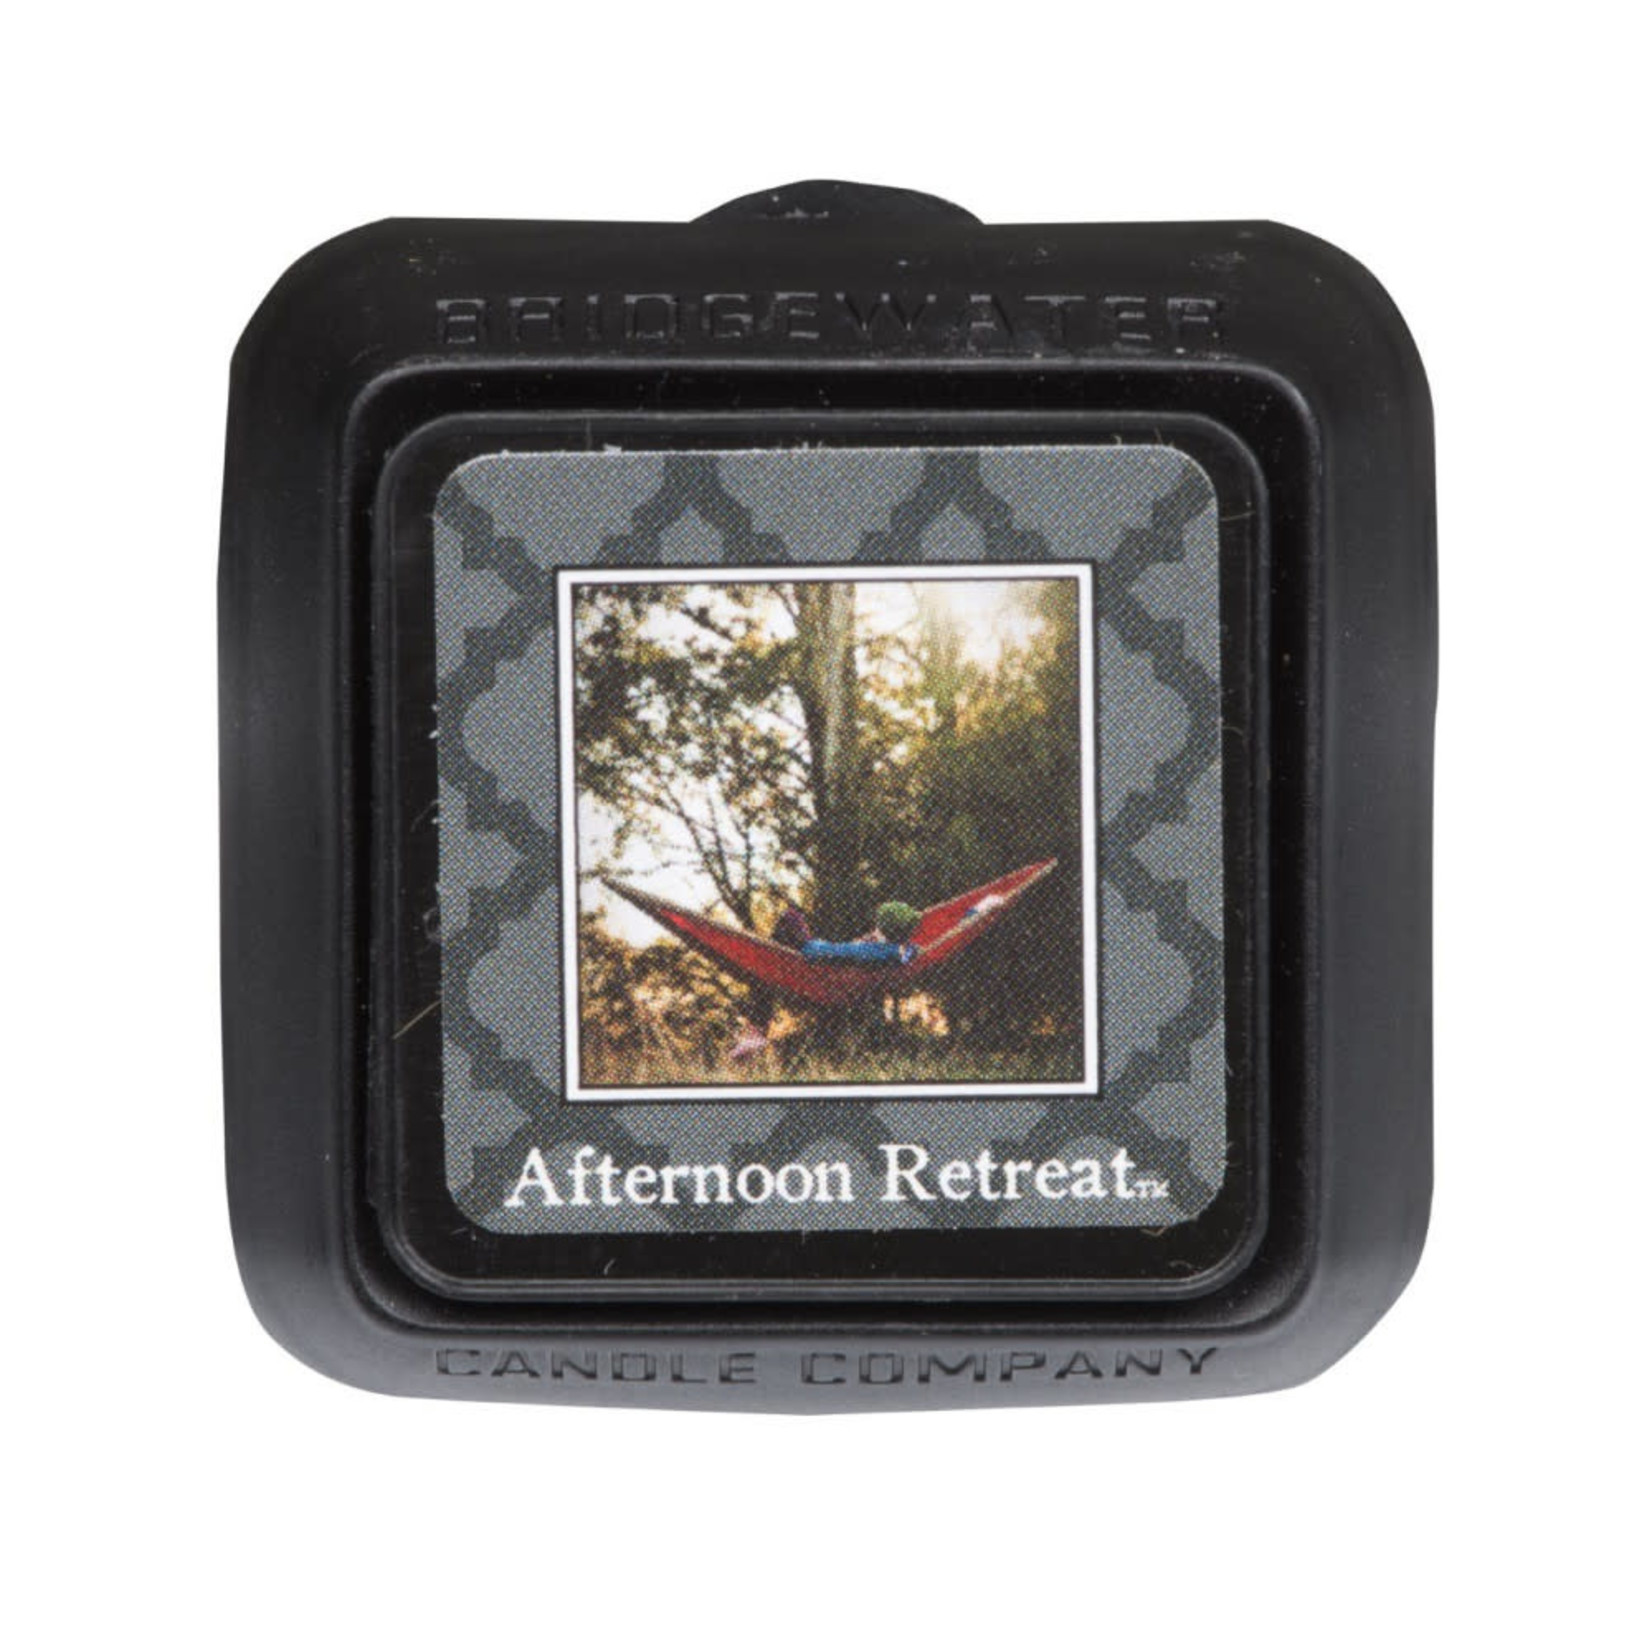 Bridgewater Car Perfume / Auto Parfum Afternoon Retreat